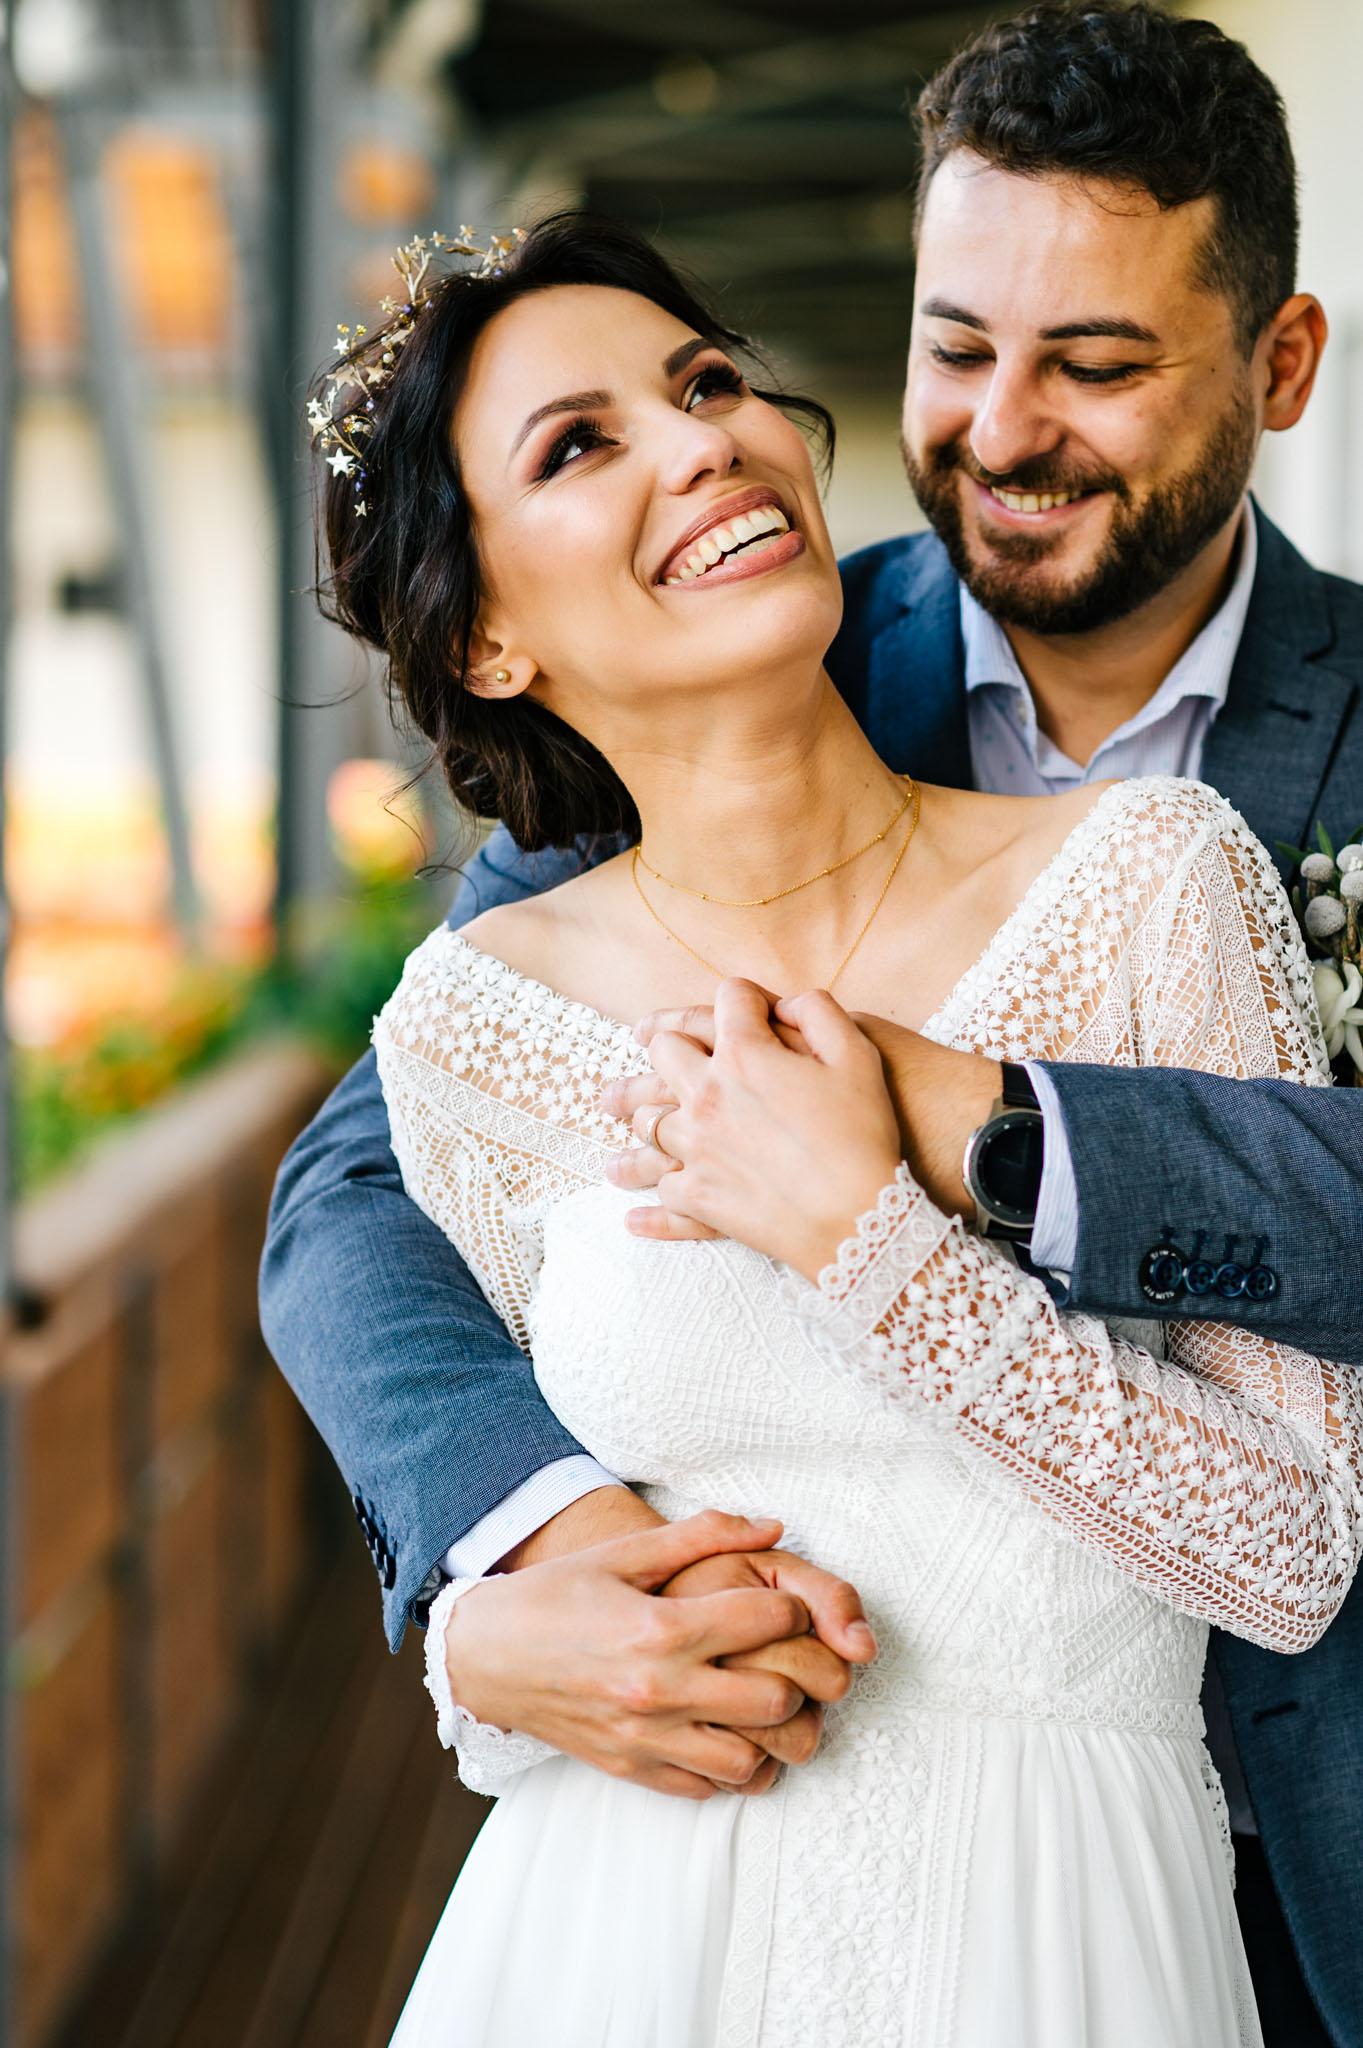 Fotografie de nunta fotograf Dana Sacalov la Casa Vlasia